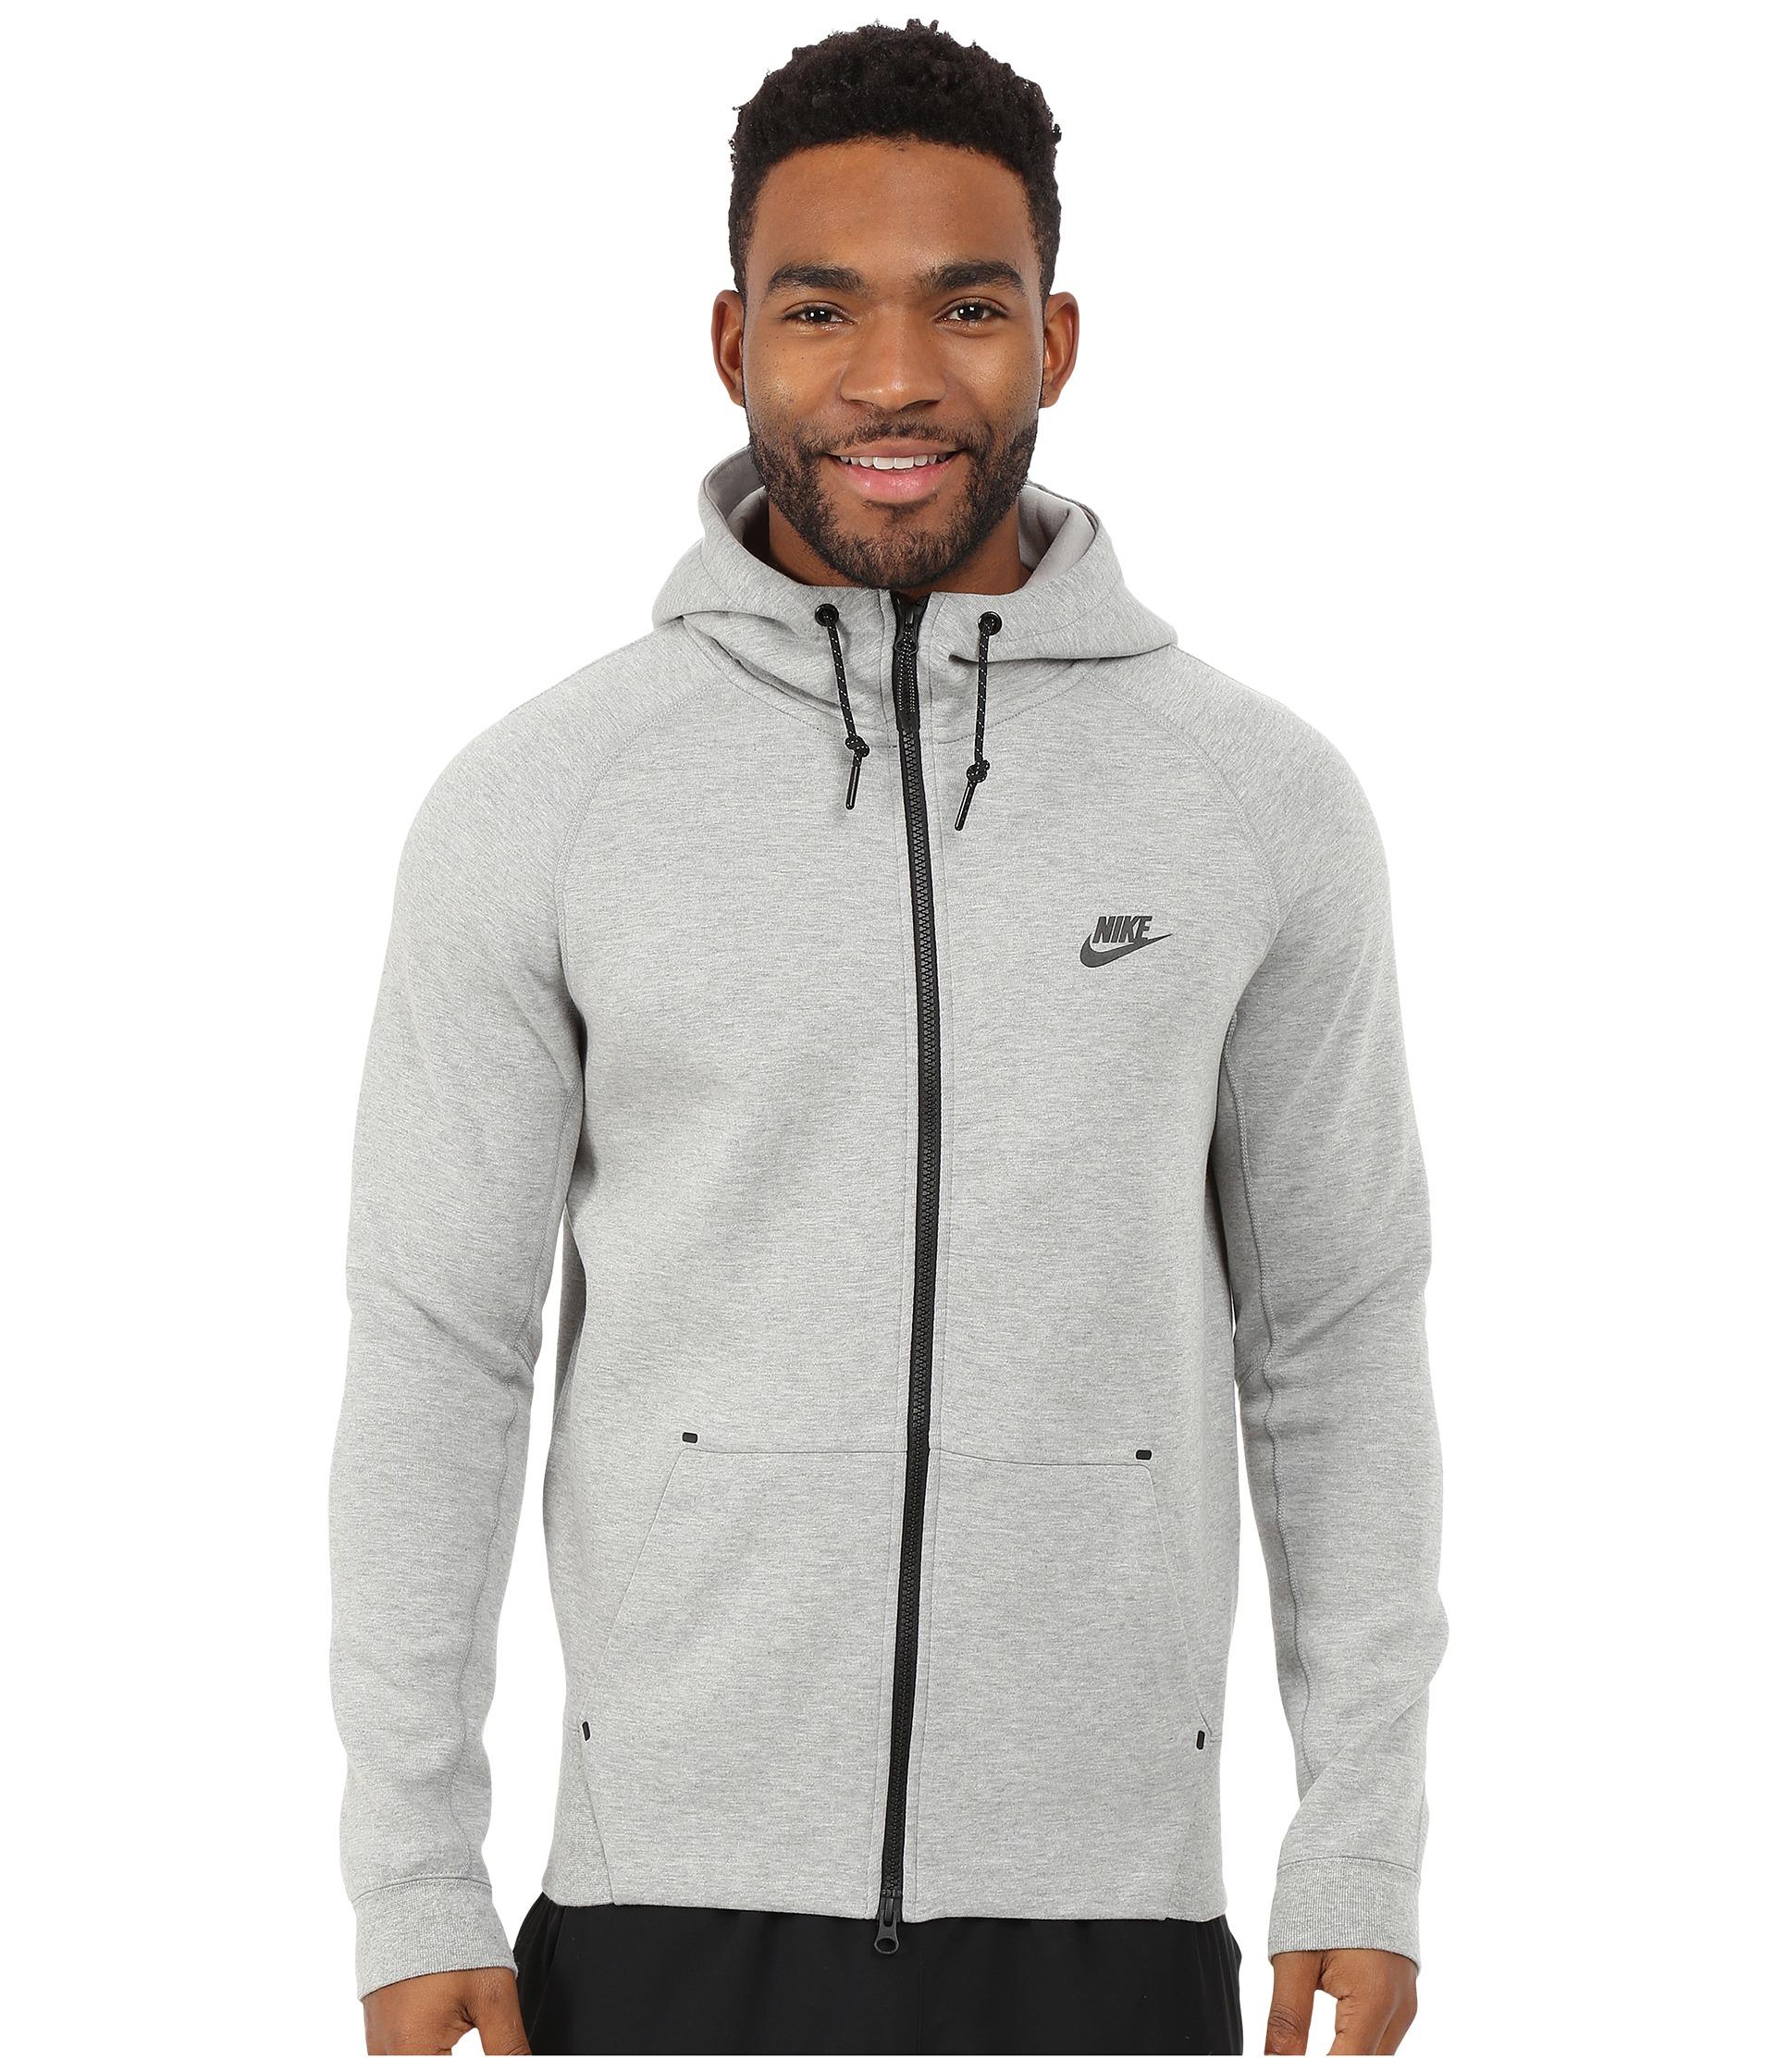 nike tech fleece aw77 1 0 full zip hoodie in gray for men. Black Bedroom Furniture Sets. Home Design Ideas